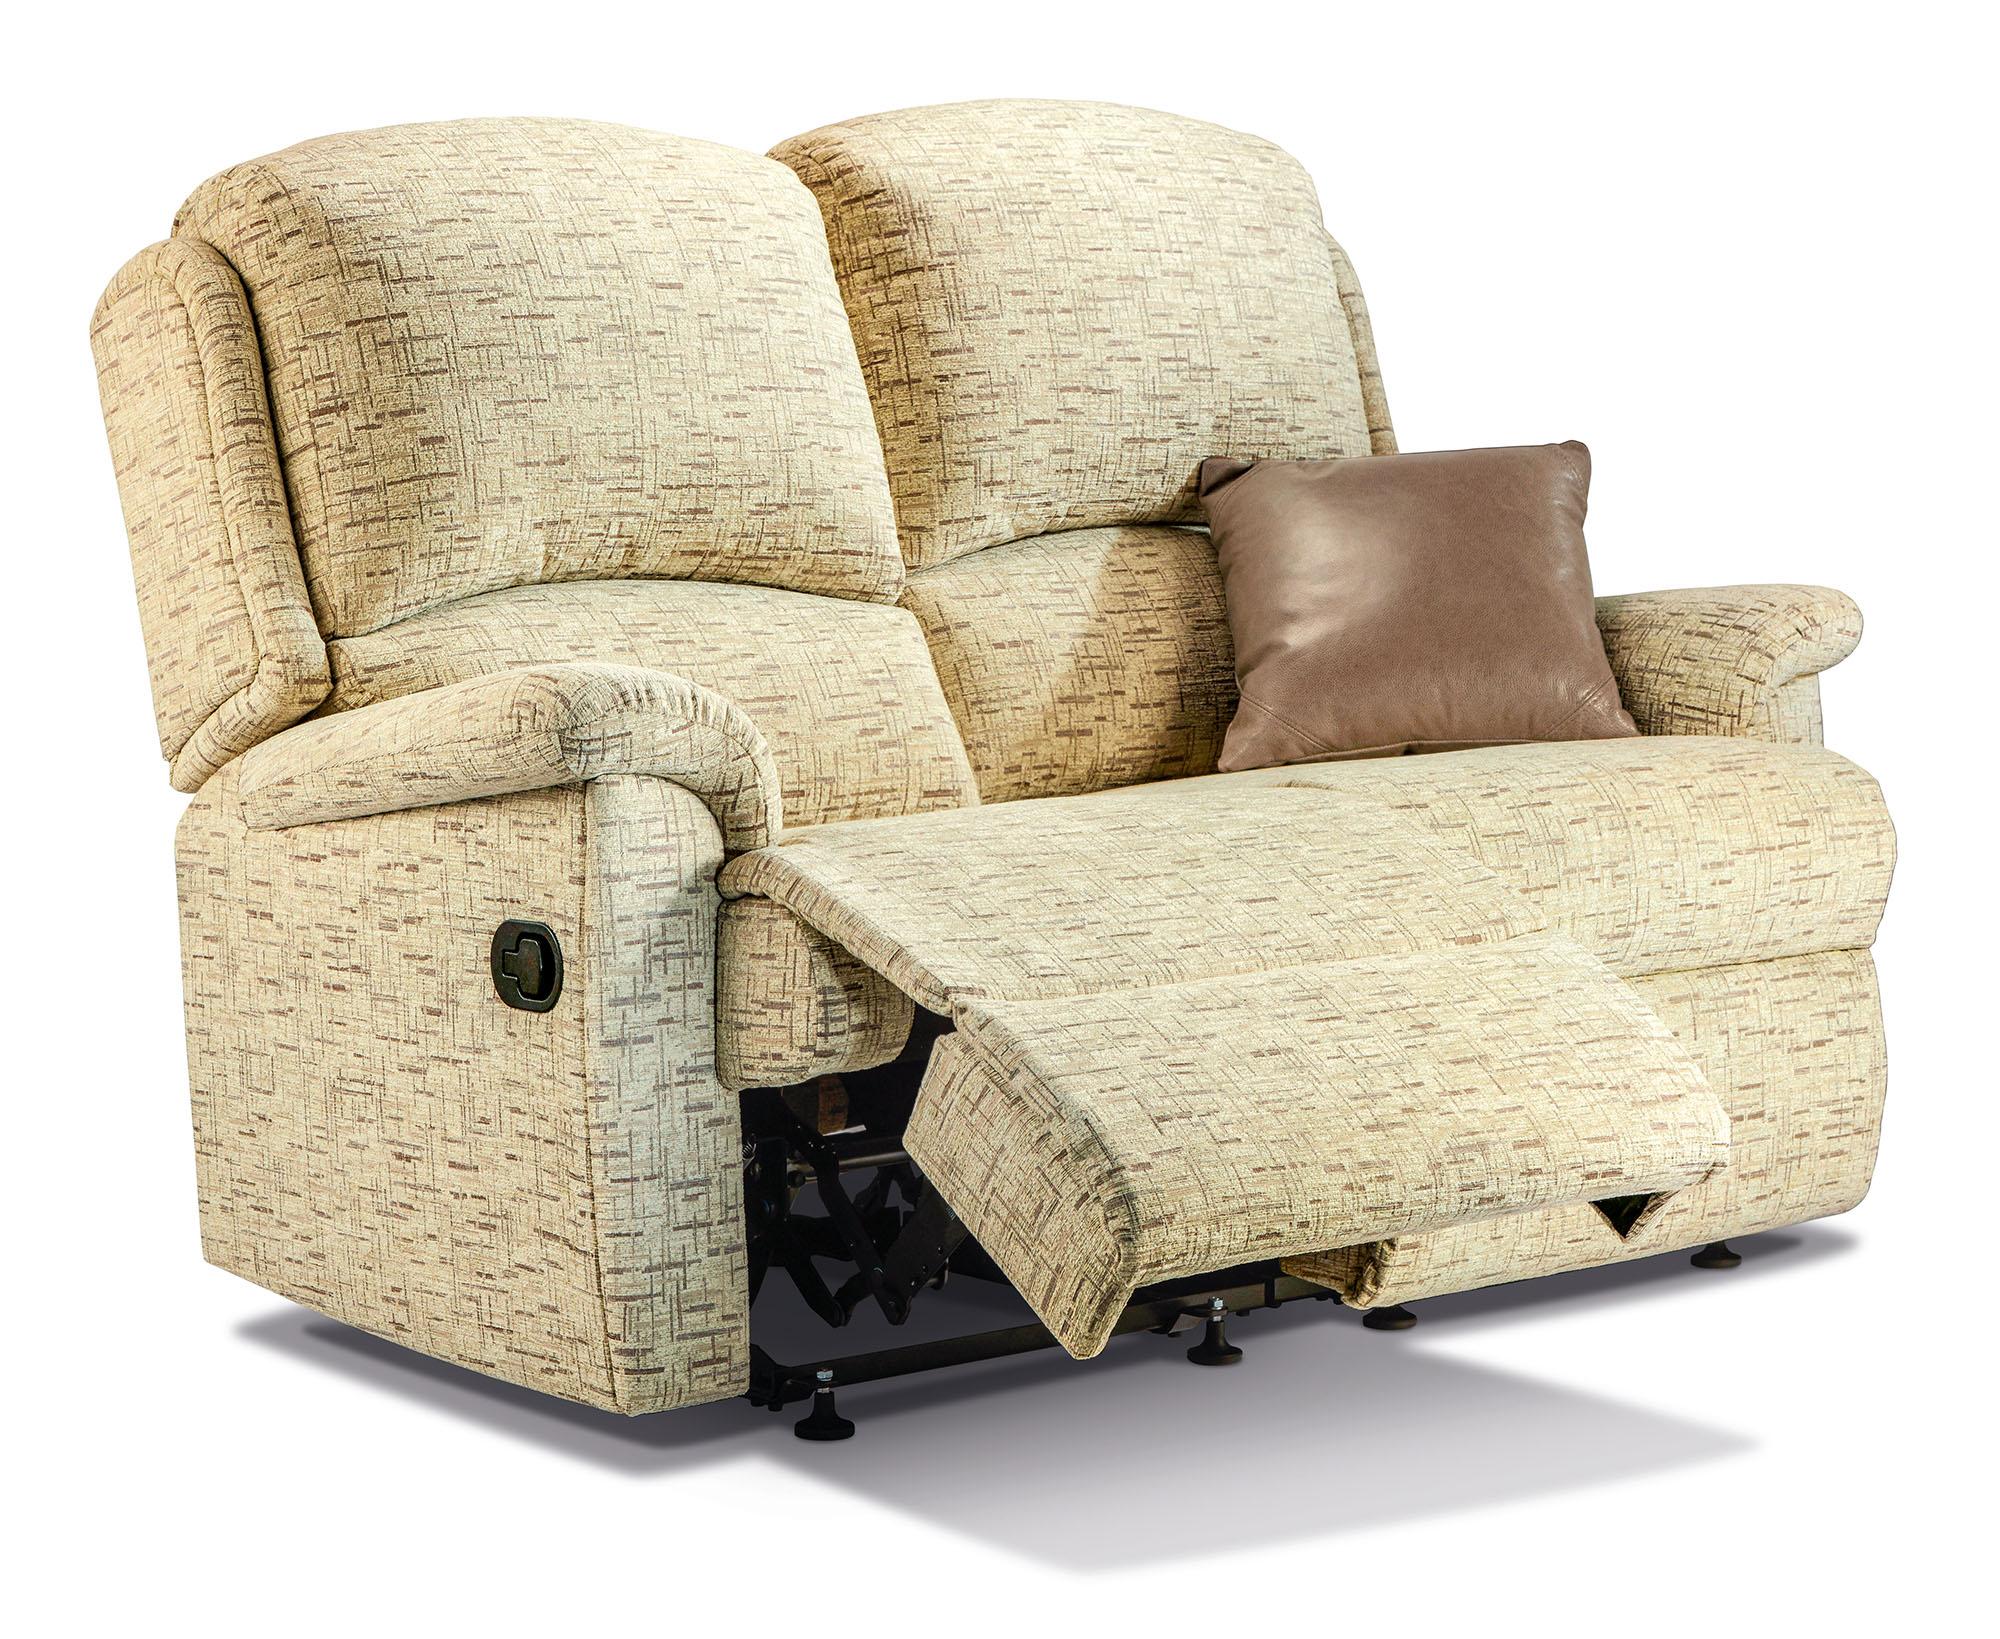 Virginia 2 seater recliner